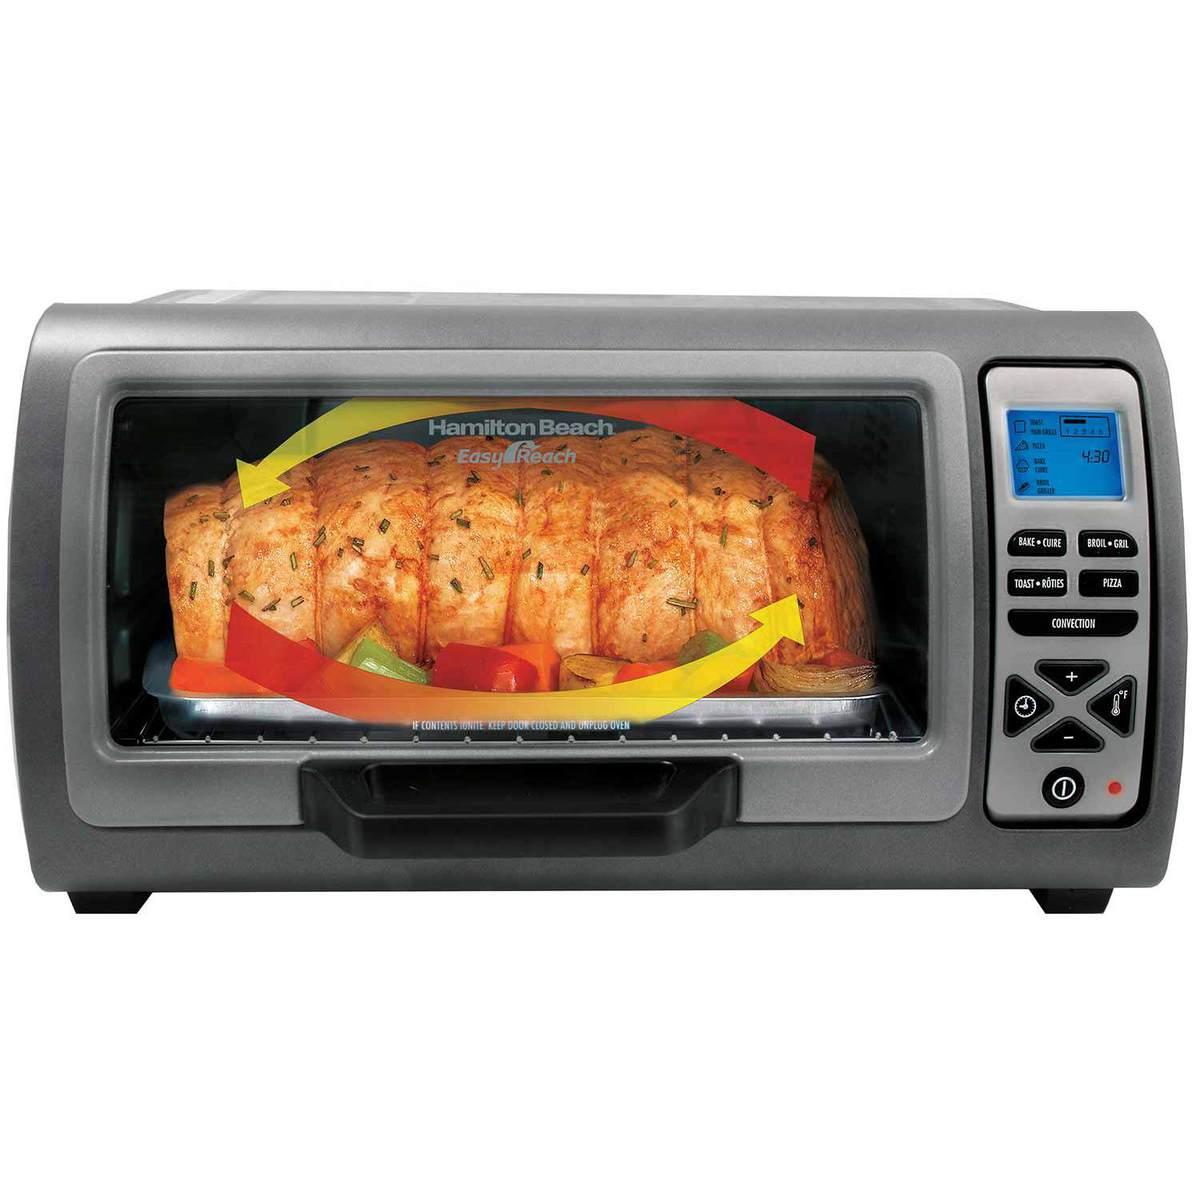 Hamilton Beach 6 Slice Easy Reach™ Toaster Oven